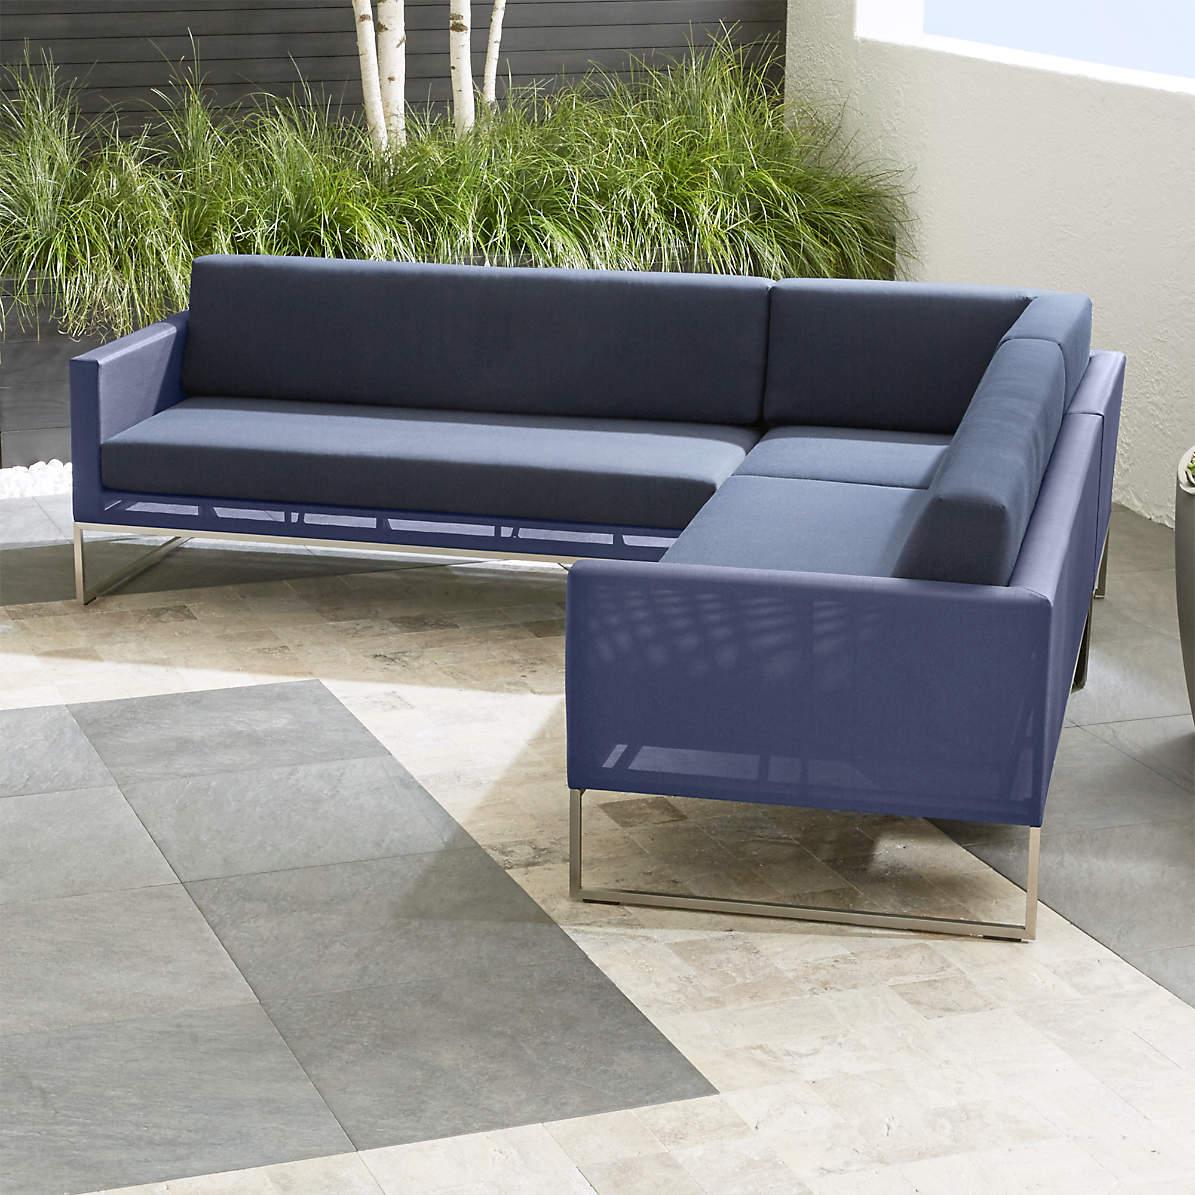 dune navy 3 piece sectional sofa with sunbrella cushions